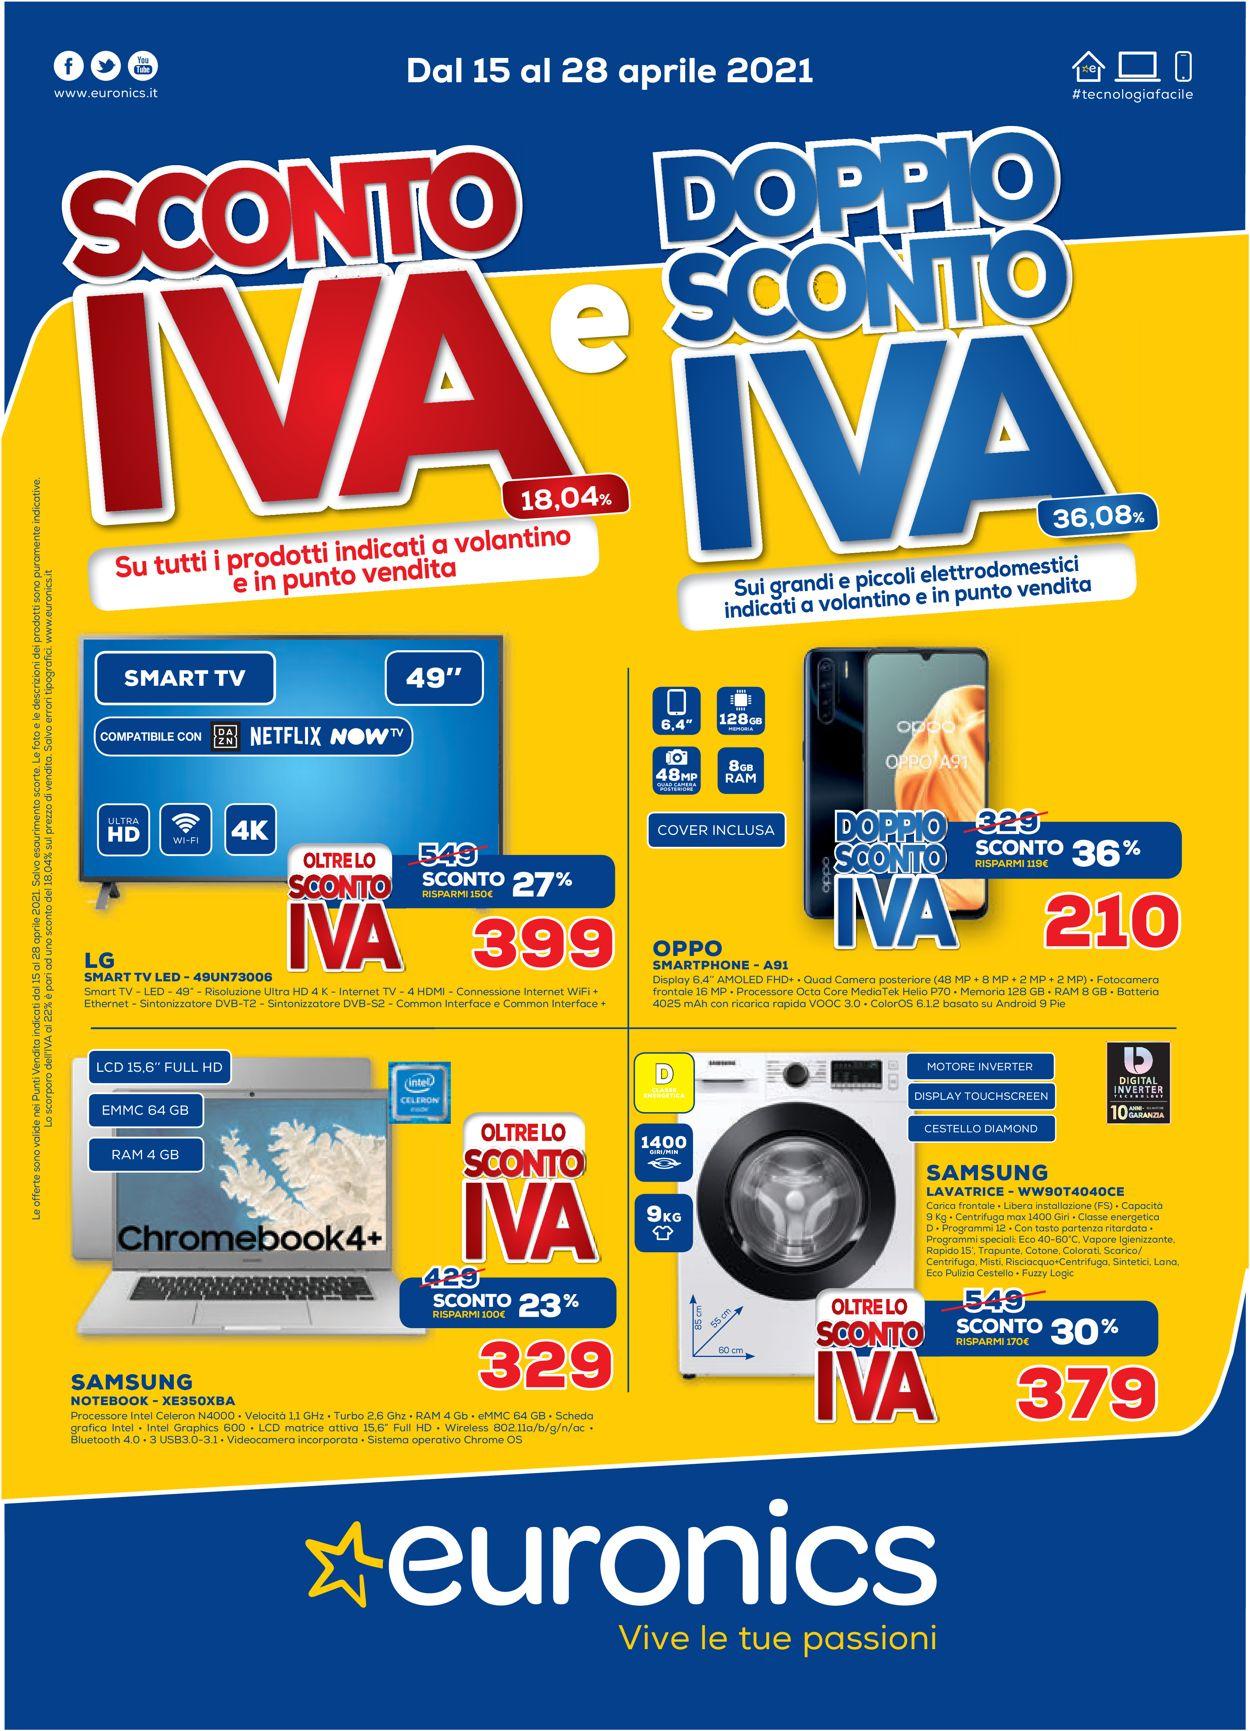 Volantino Euronics - Offerte 14/04-28/04/2021